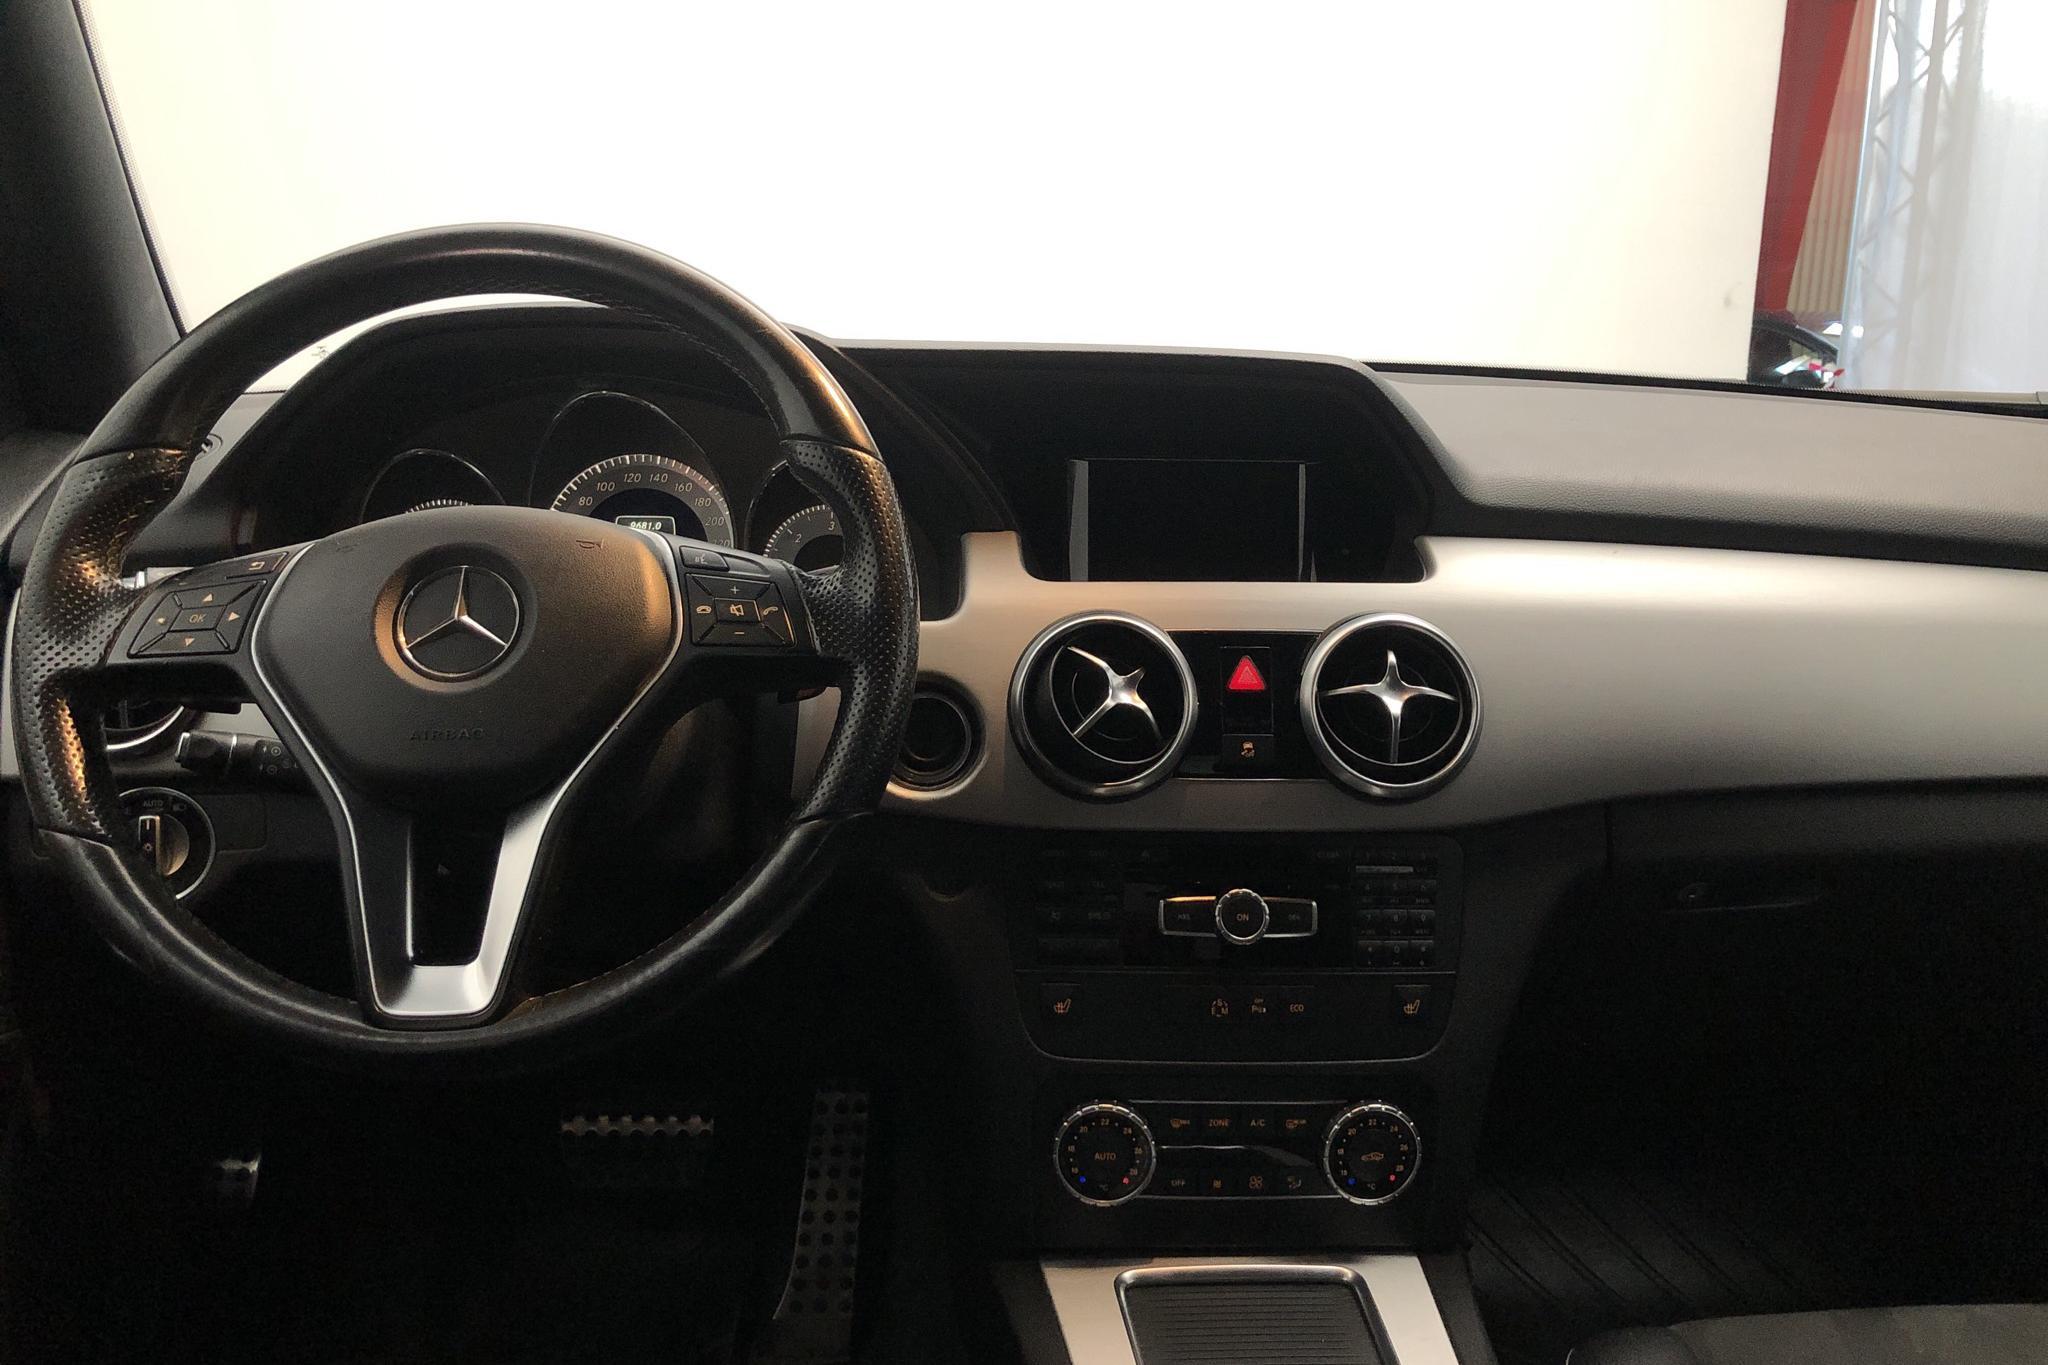 Mercedes GLK 220 CDI 4MATIC X204 (170hk) - 11 538 mil - Automat - silver - 2015